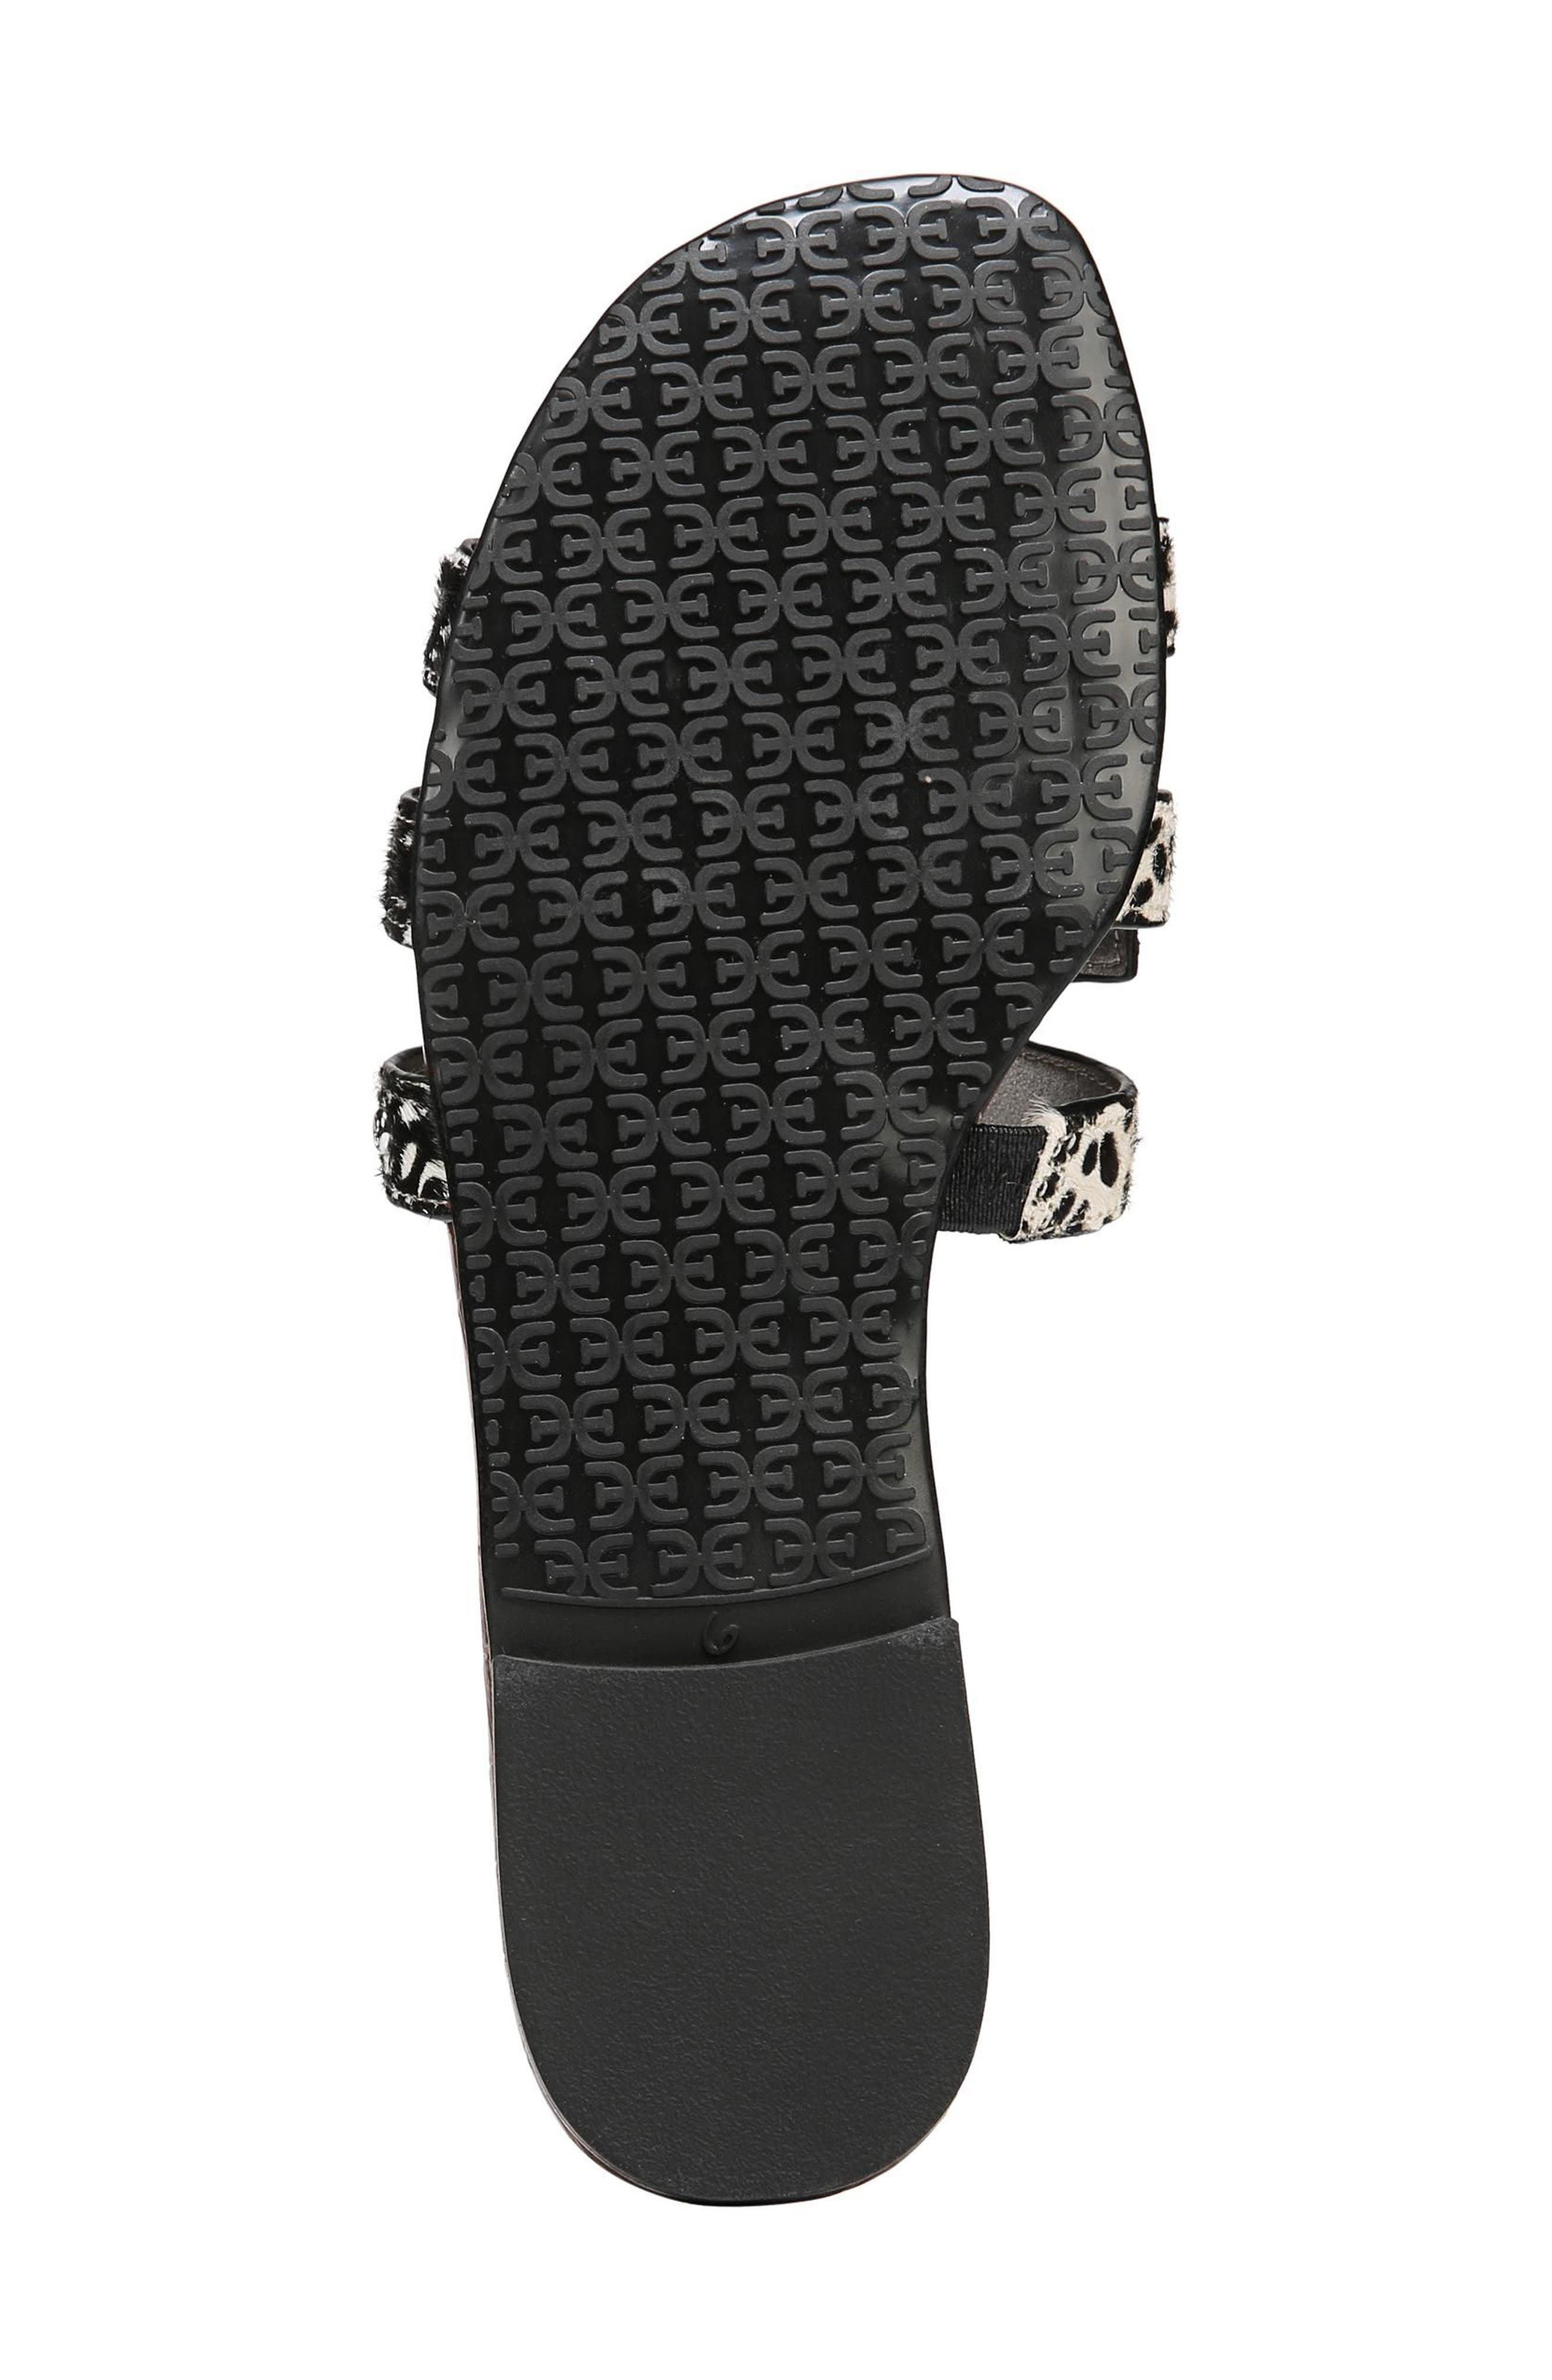 Bay Genuine Calf Hair Slide Sandal,                             Alternate thumbnail 6, color,                             BLACK/ IVORY BRAHMA HAIR